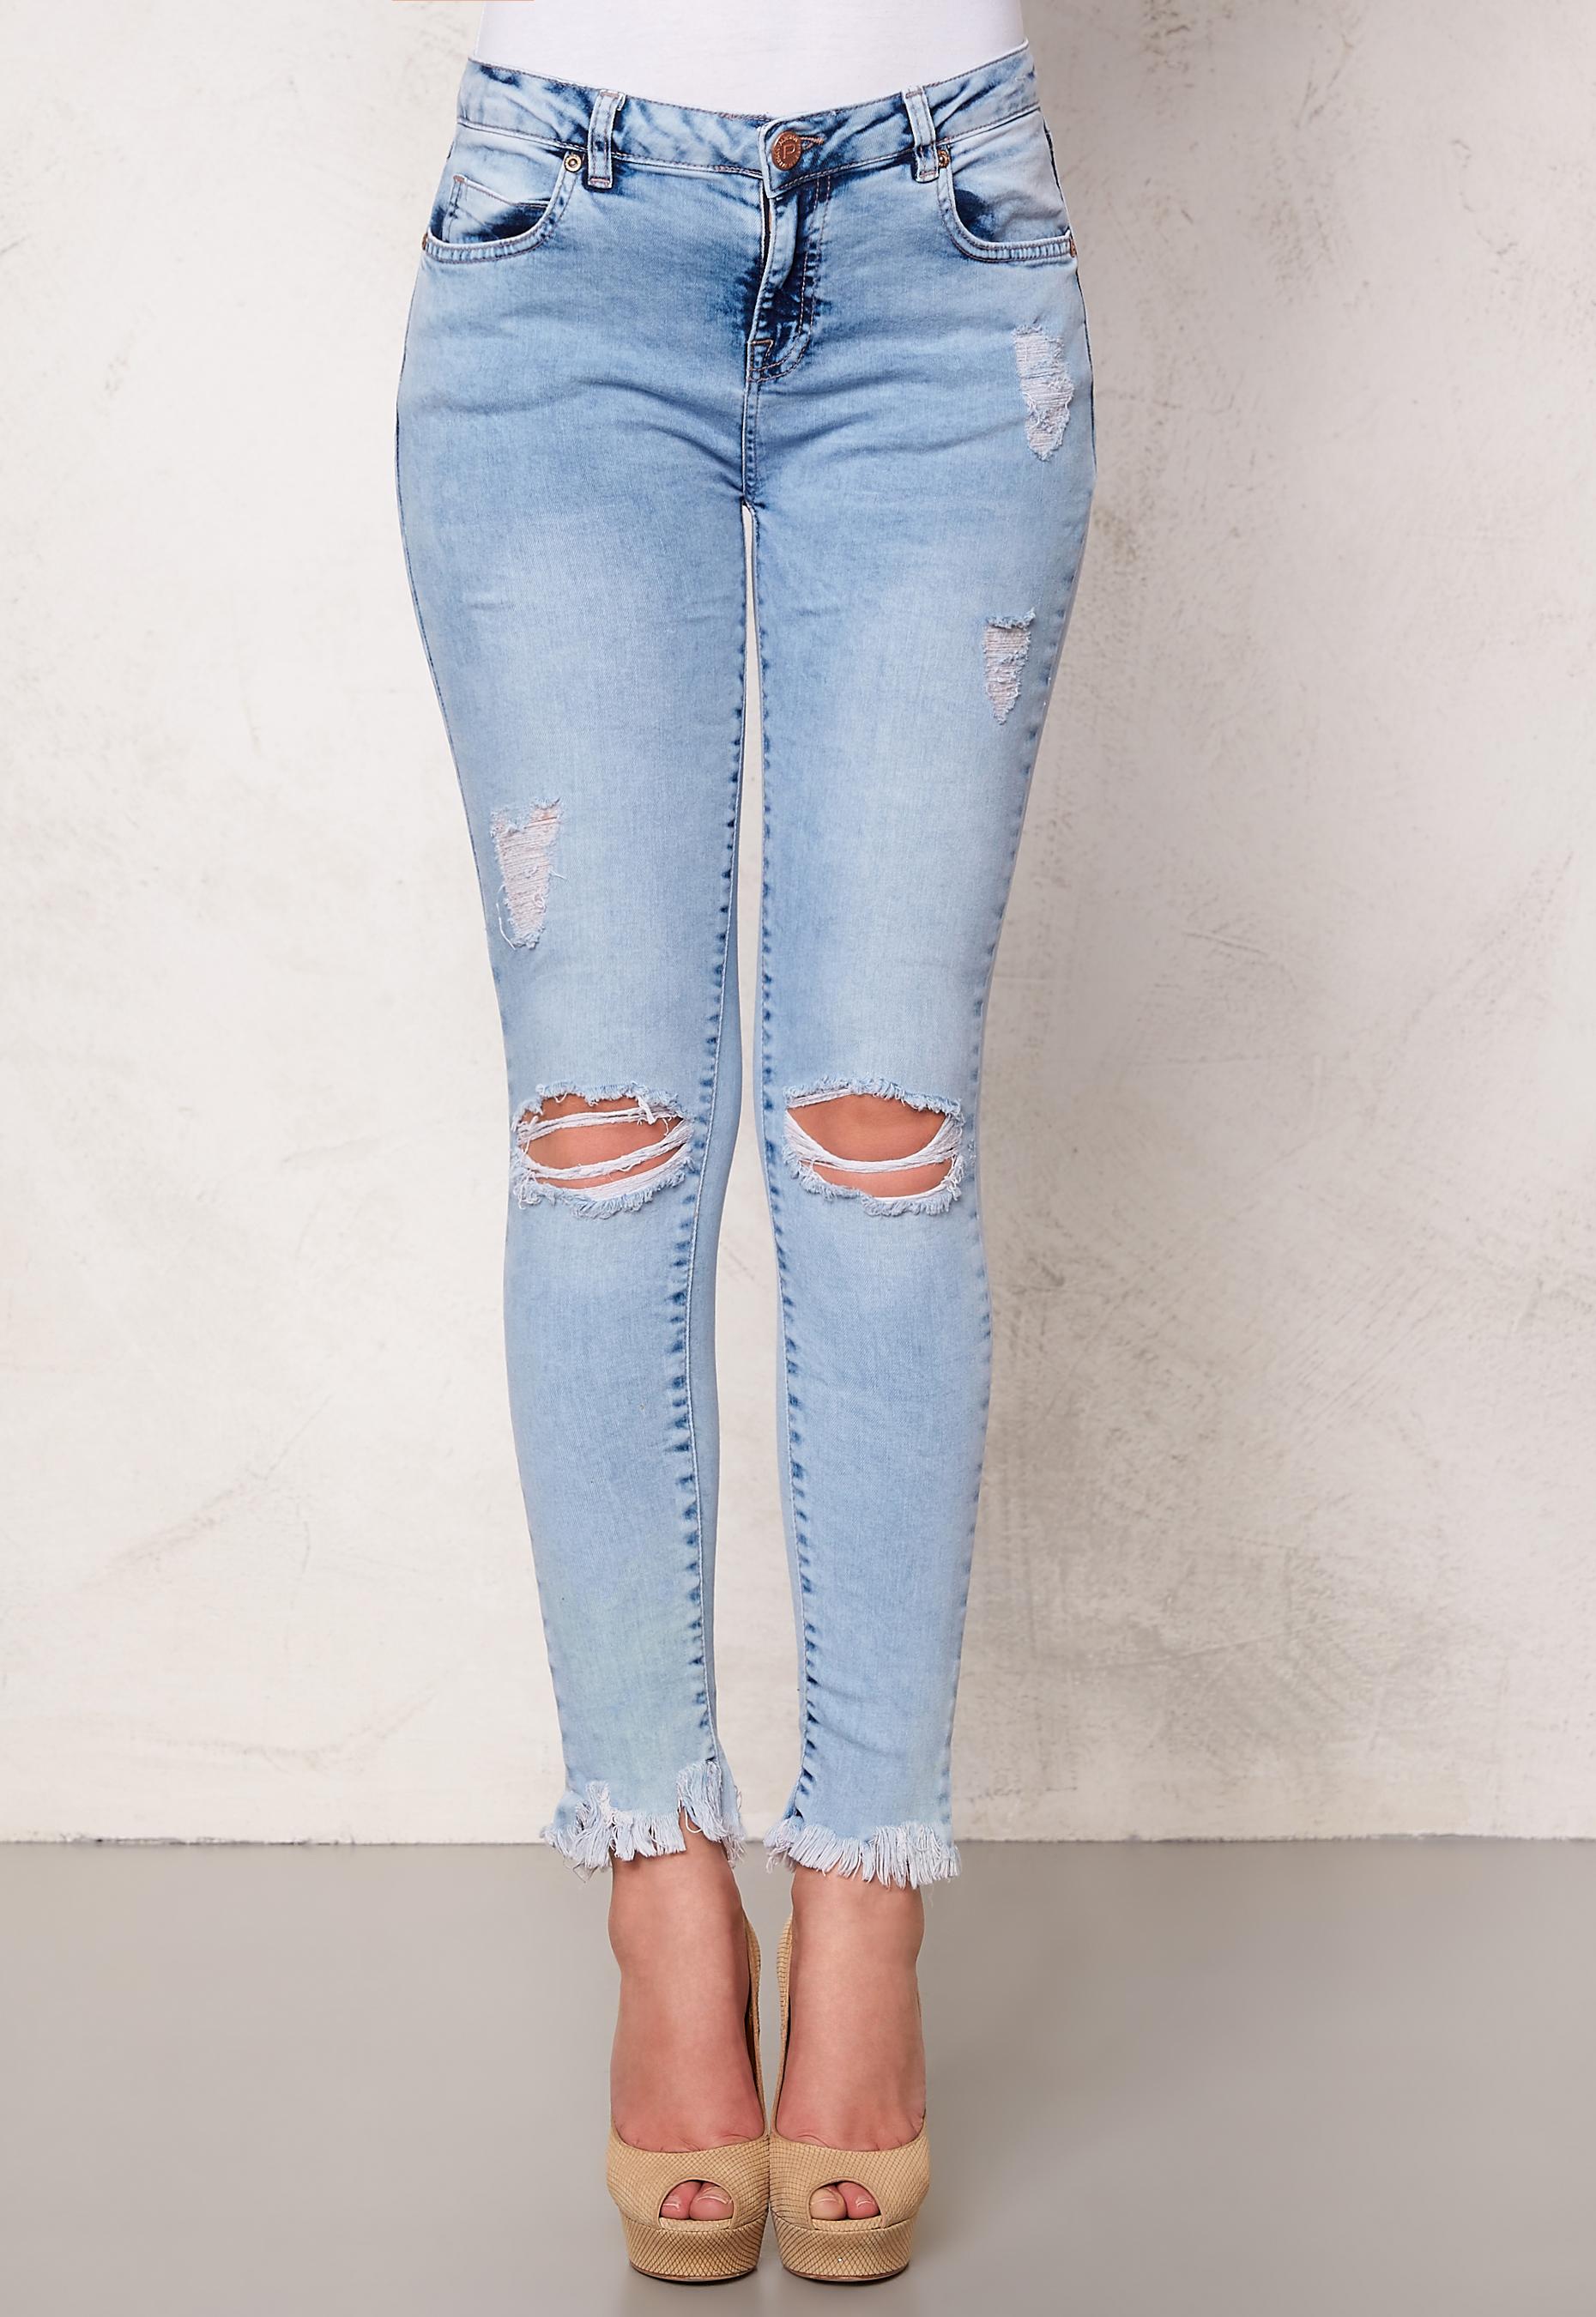 acid-wash-ripped-jeans.jpg